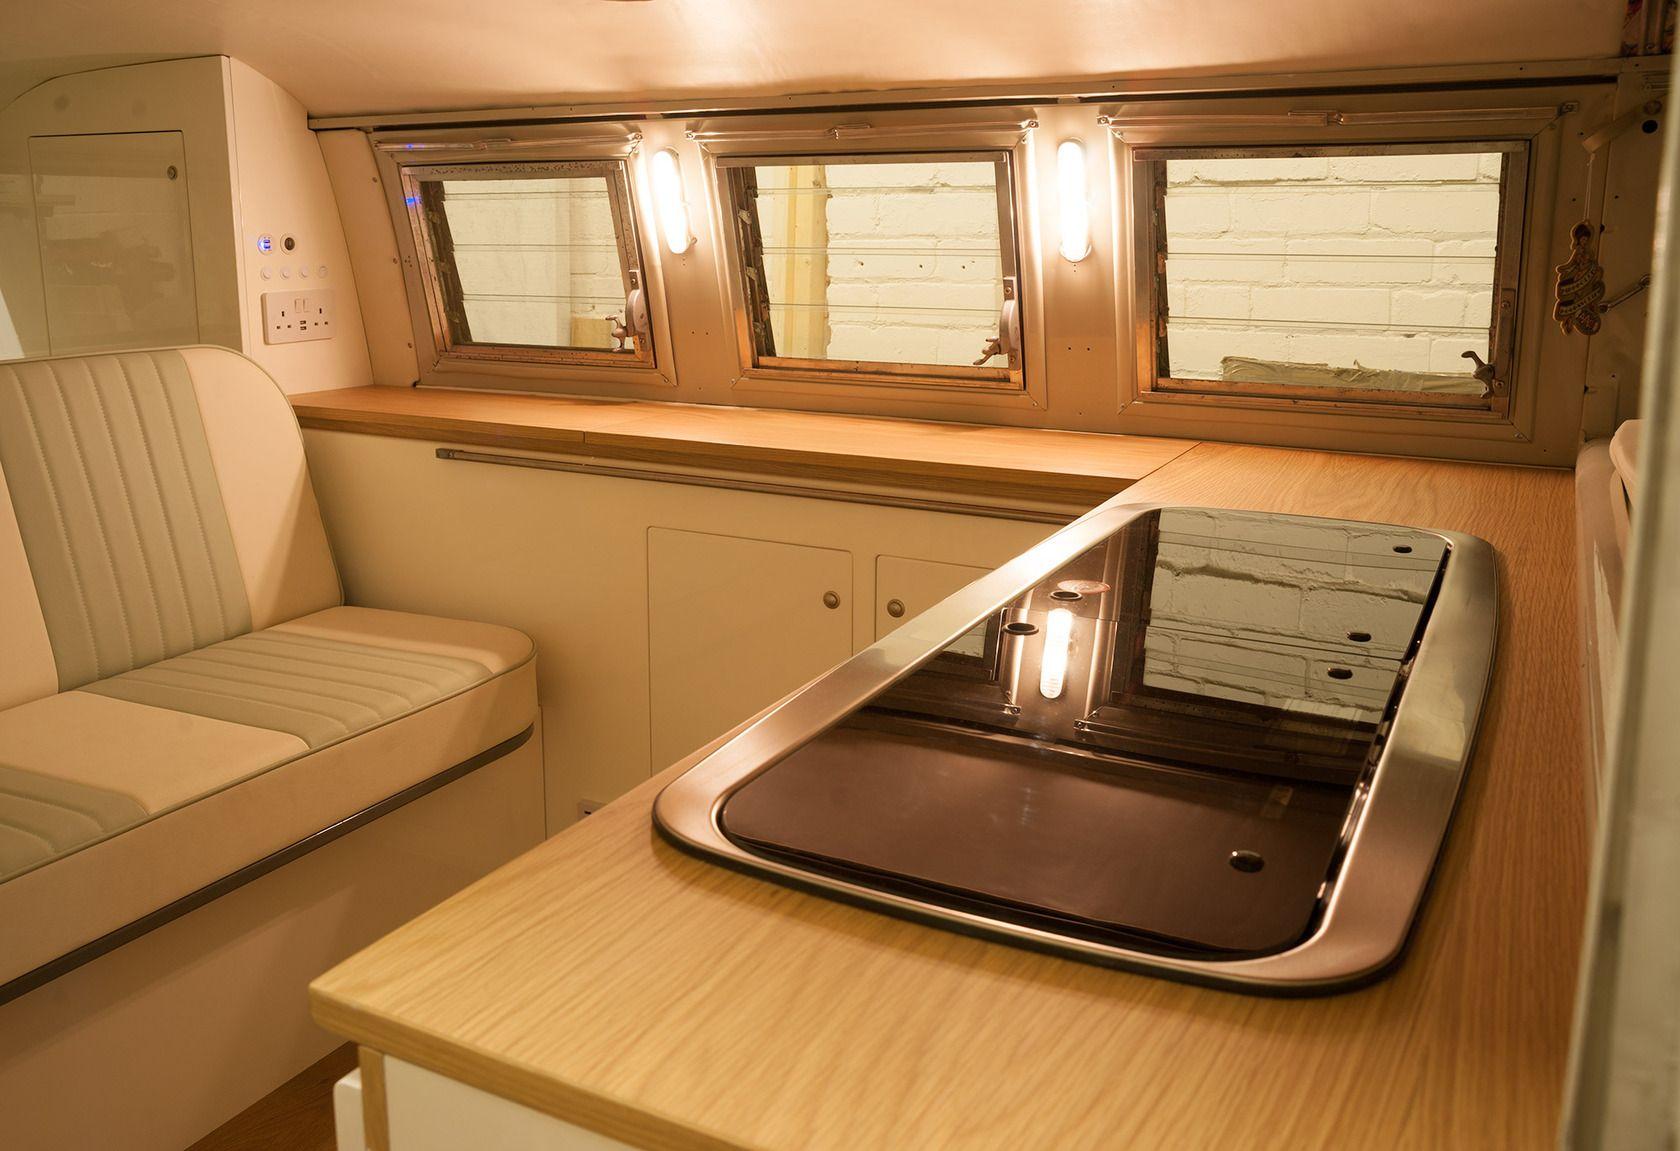 Dubteriors vw splitty interior kombi interior ideas for Kombi van interior designs